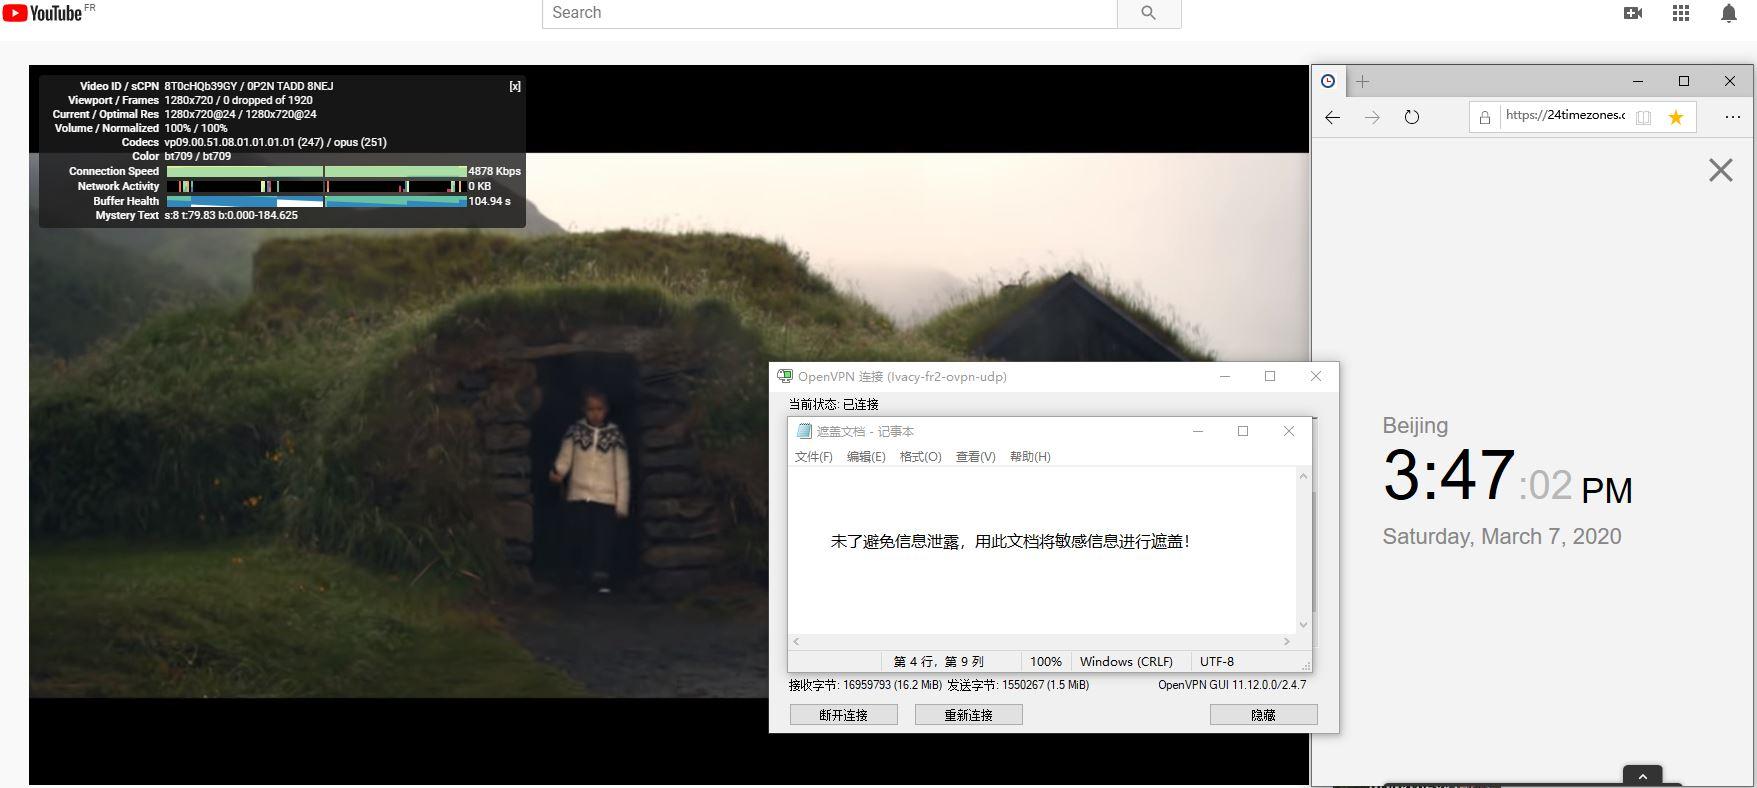 Windows10 IvacyVPN OpenVPN FR2 中国VPN翻墙 科学上网 Youtube测速 - 20200307